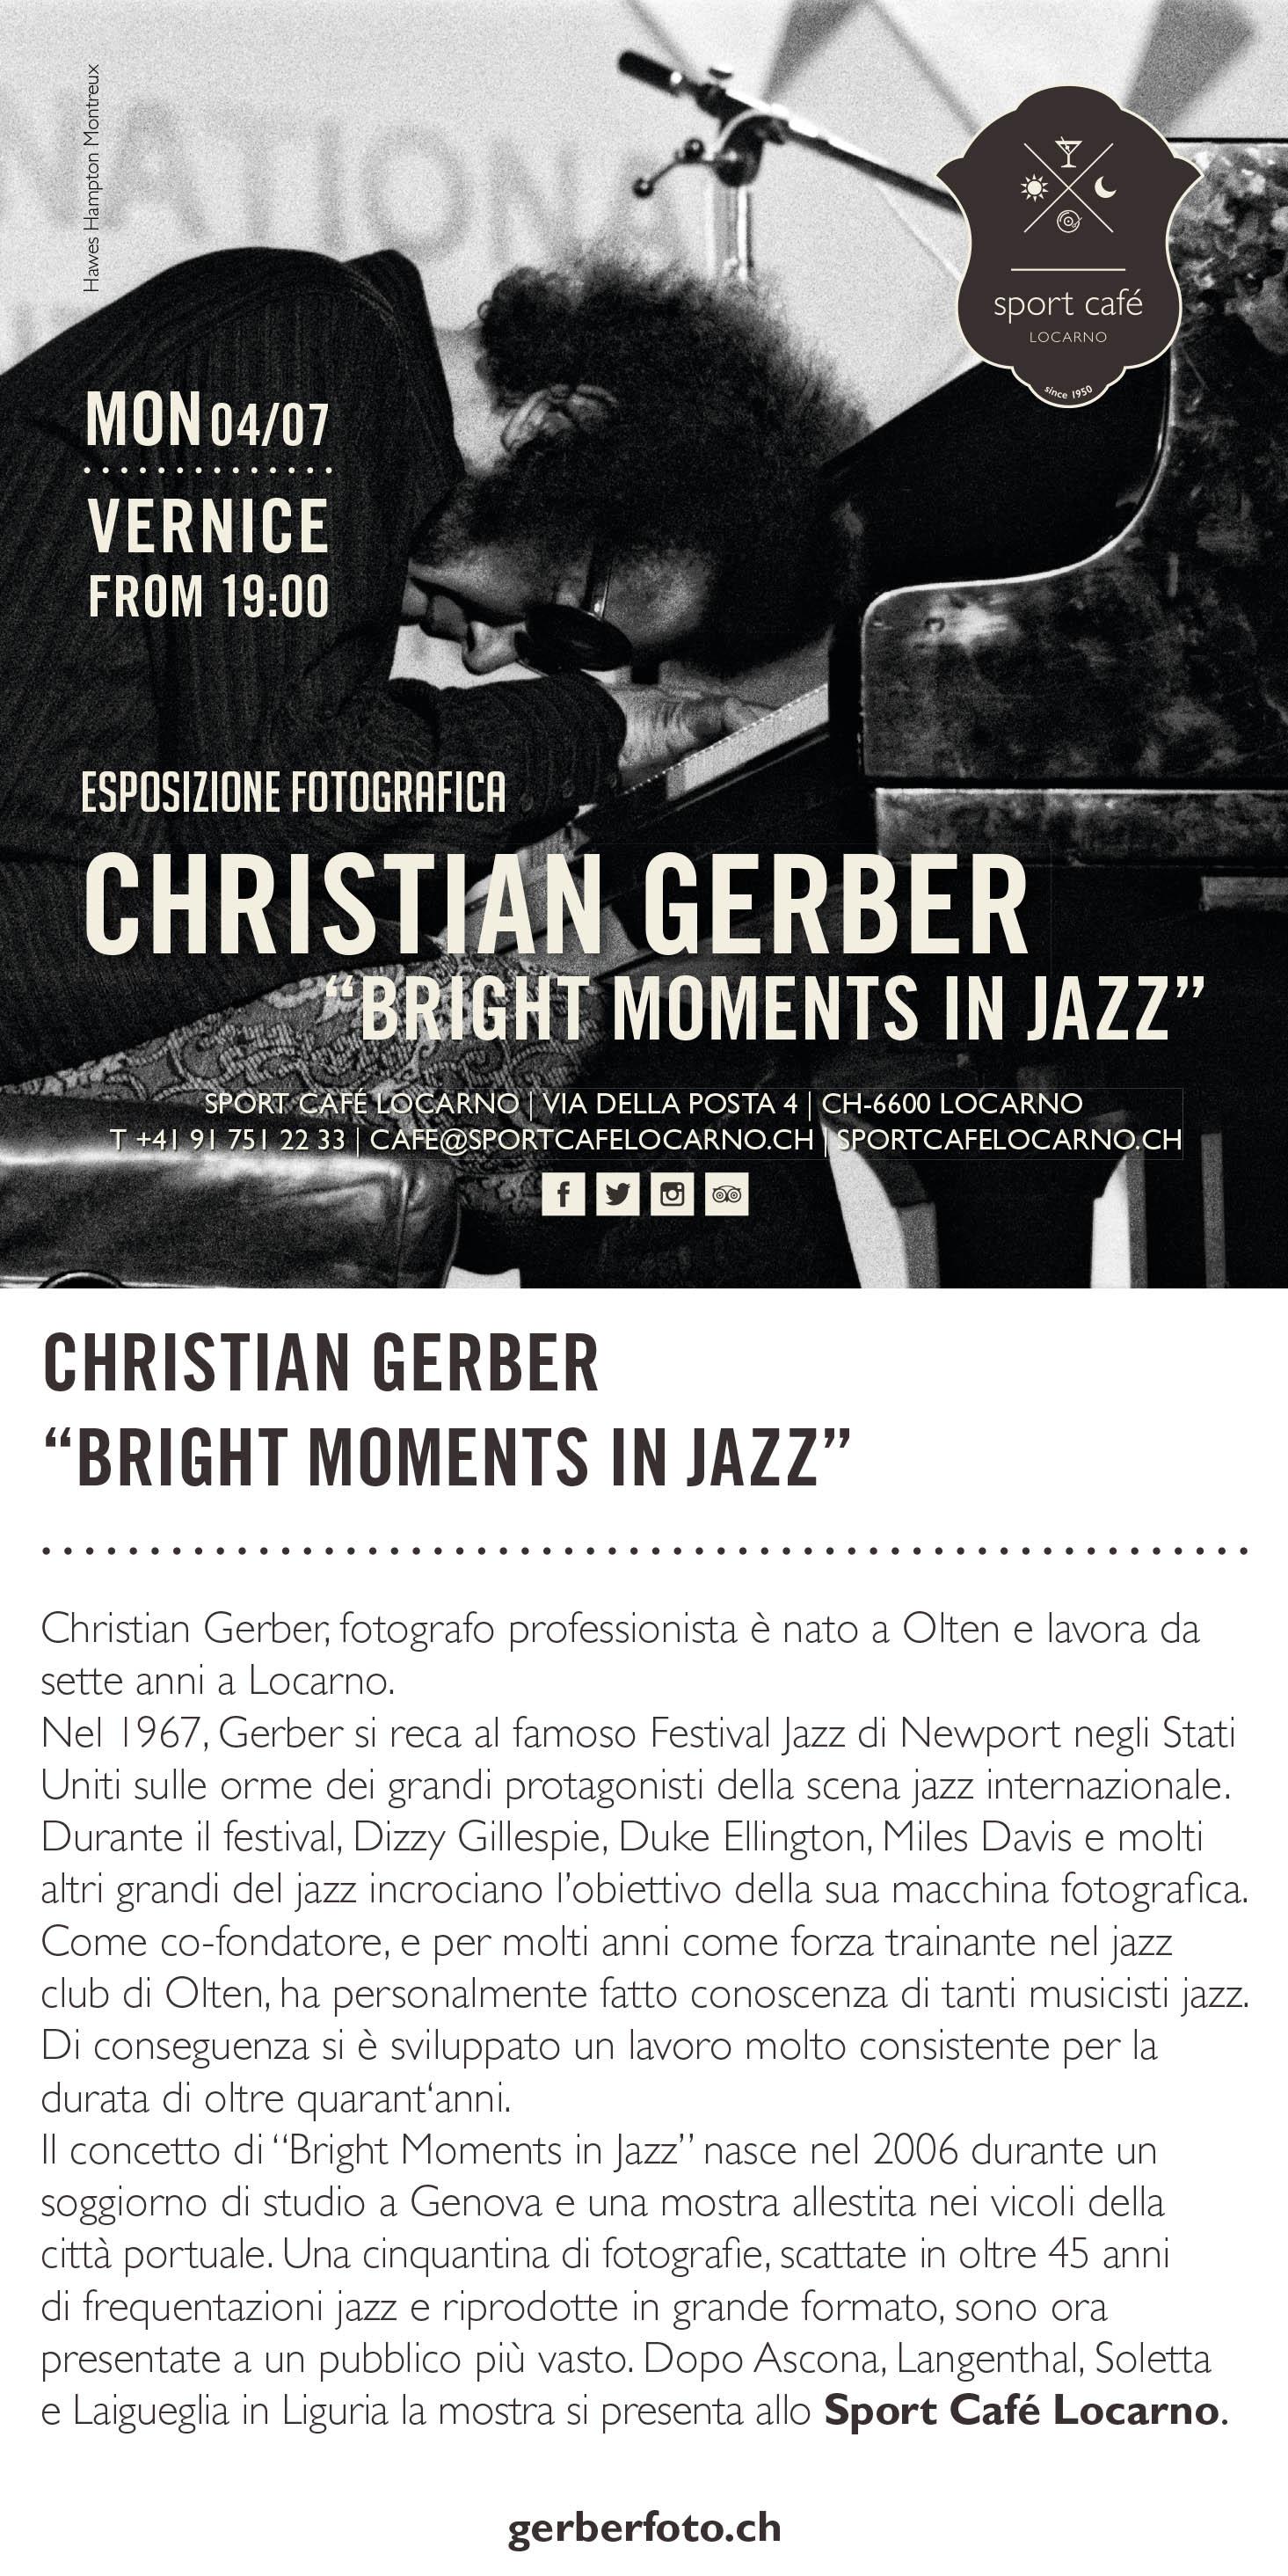 Bright moments in Jazz kl.jpg